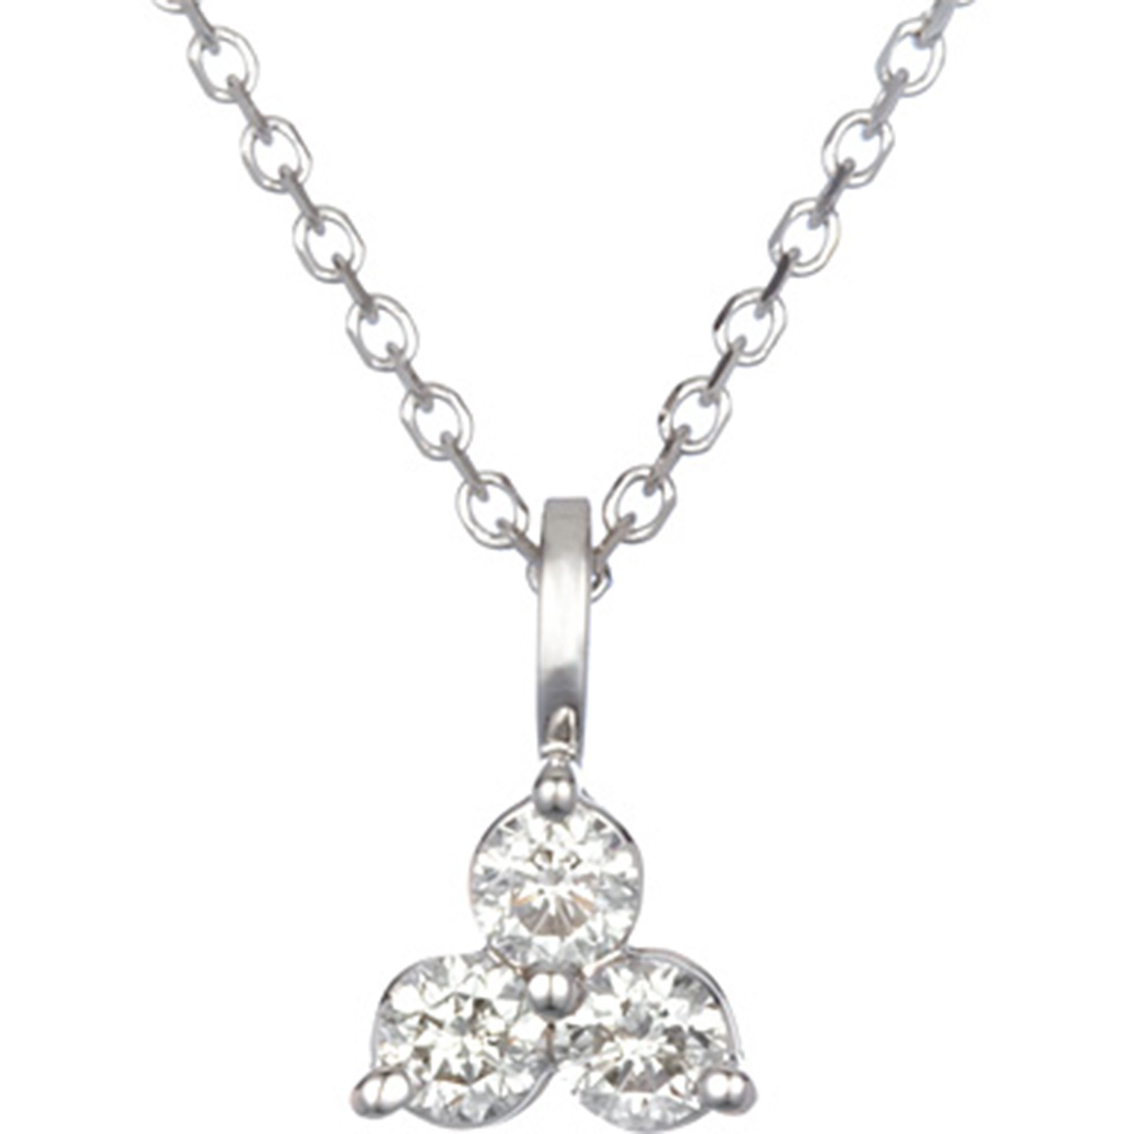 14k white gold 38 ctw triangle design 3 diamond pendant 3 stone 14k white gold 38 ctw triangle design 3 diamond pendant aloadofball Image collections